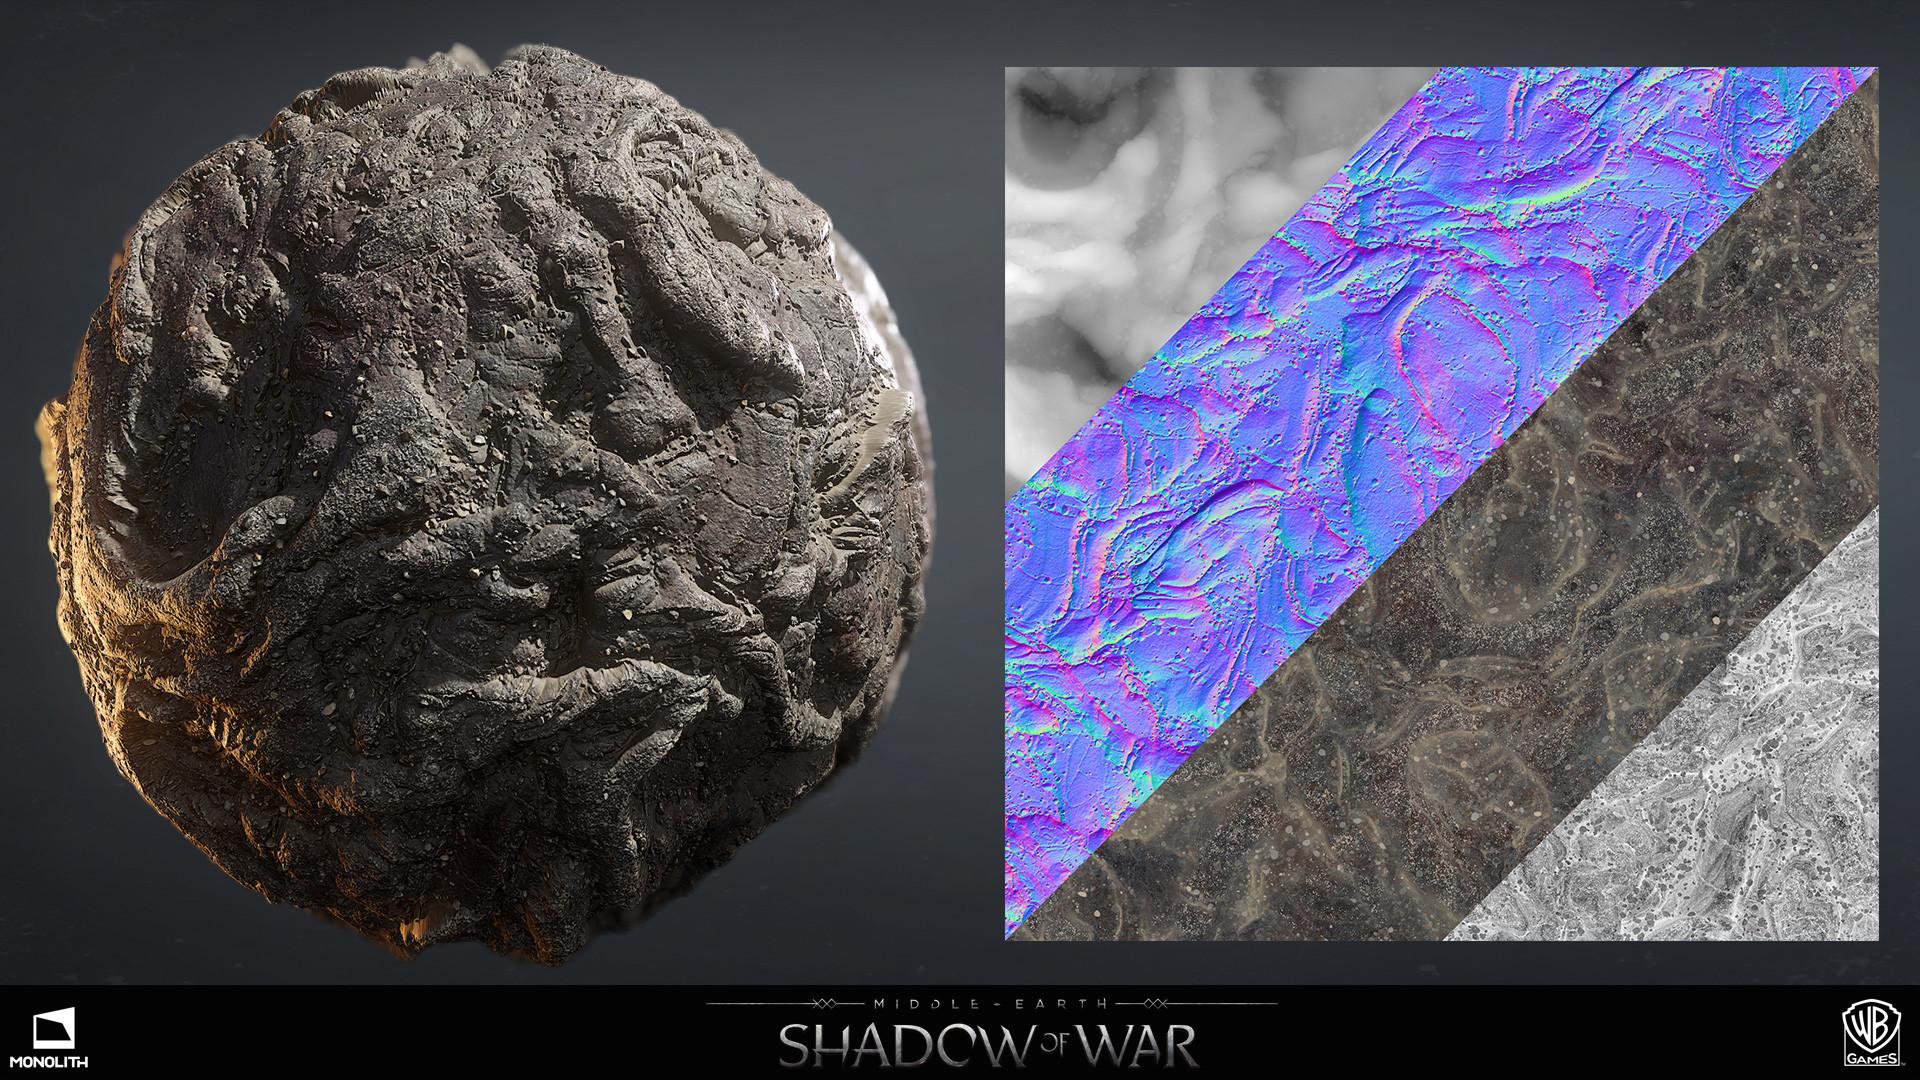 Joshua lynch sow volcano terrain lava 01 layout